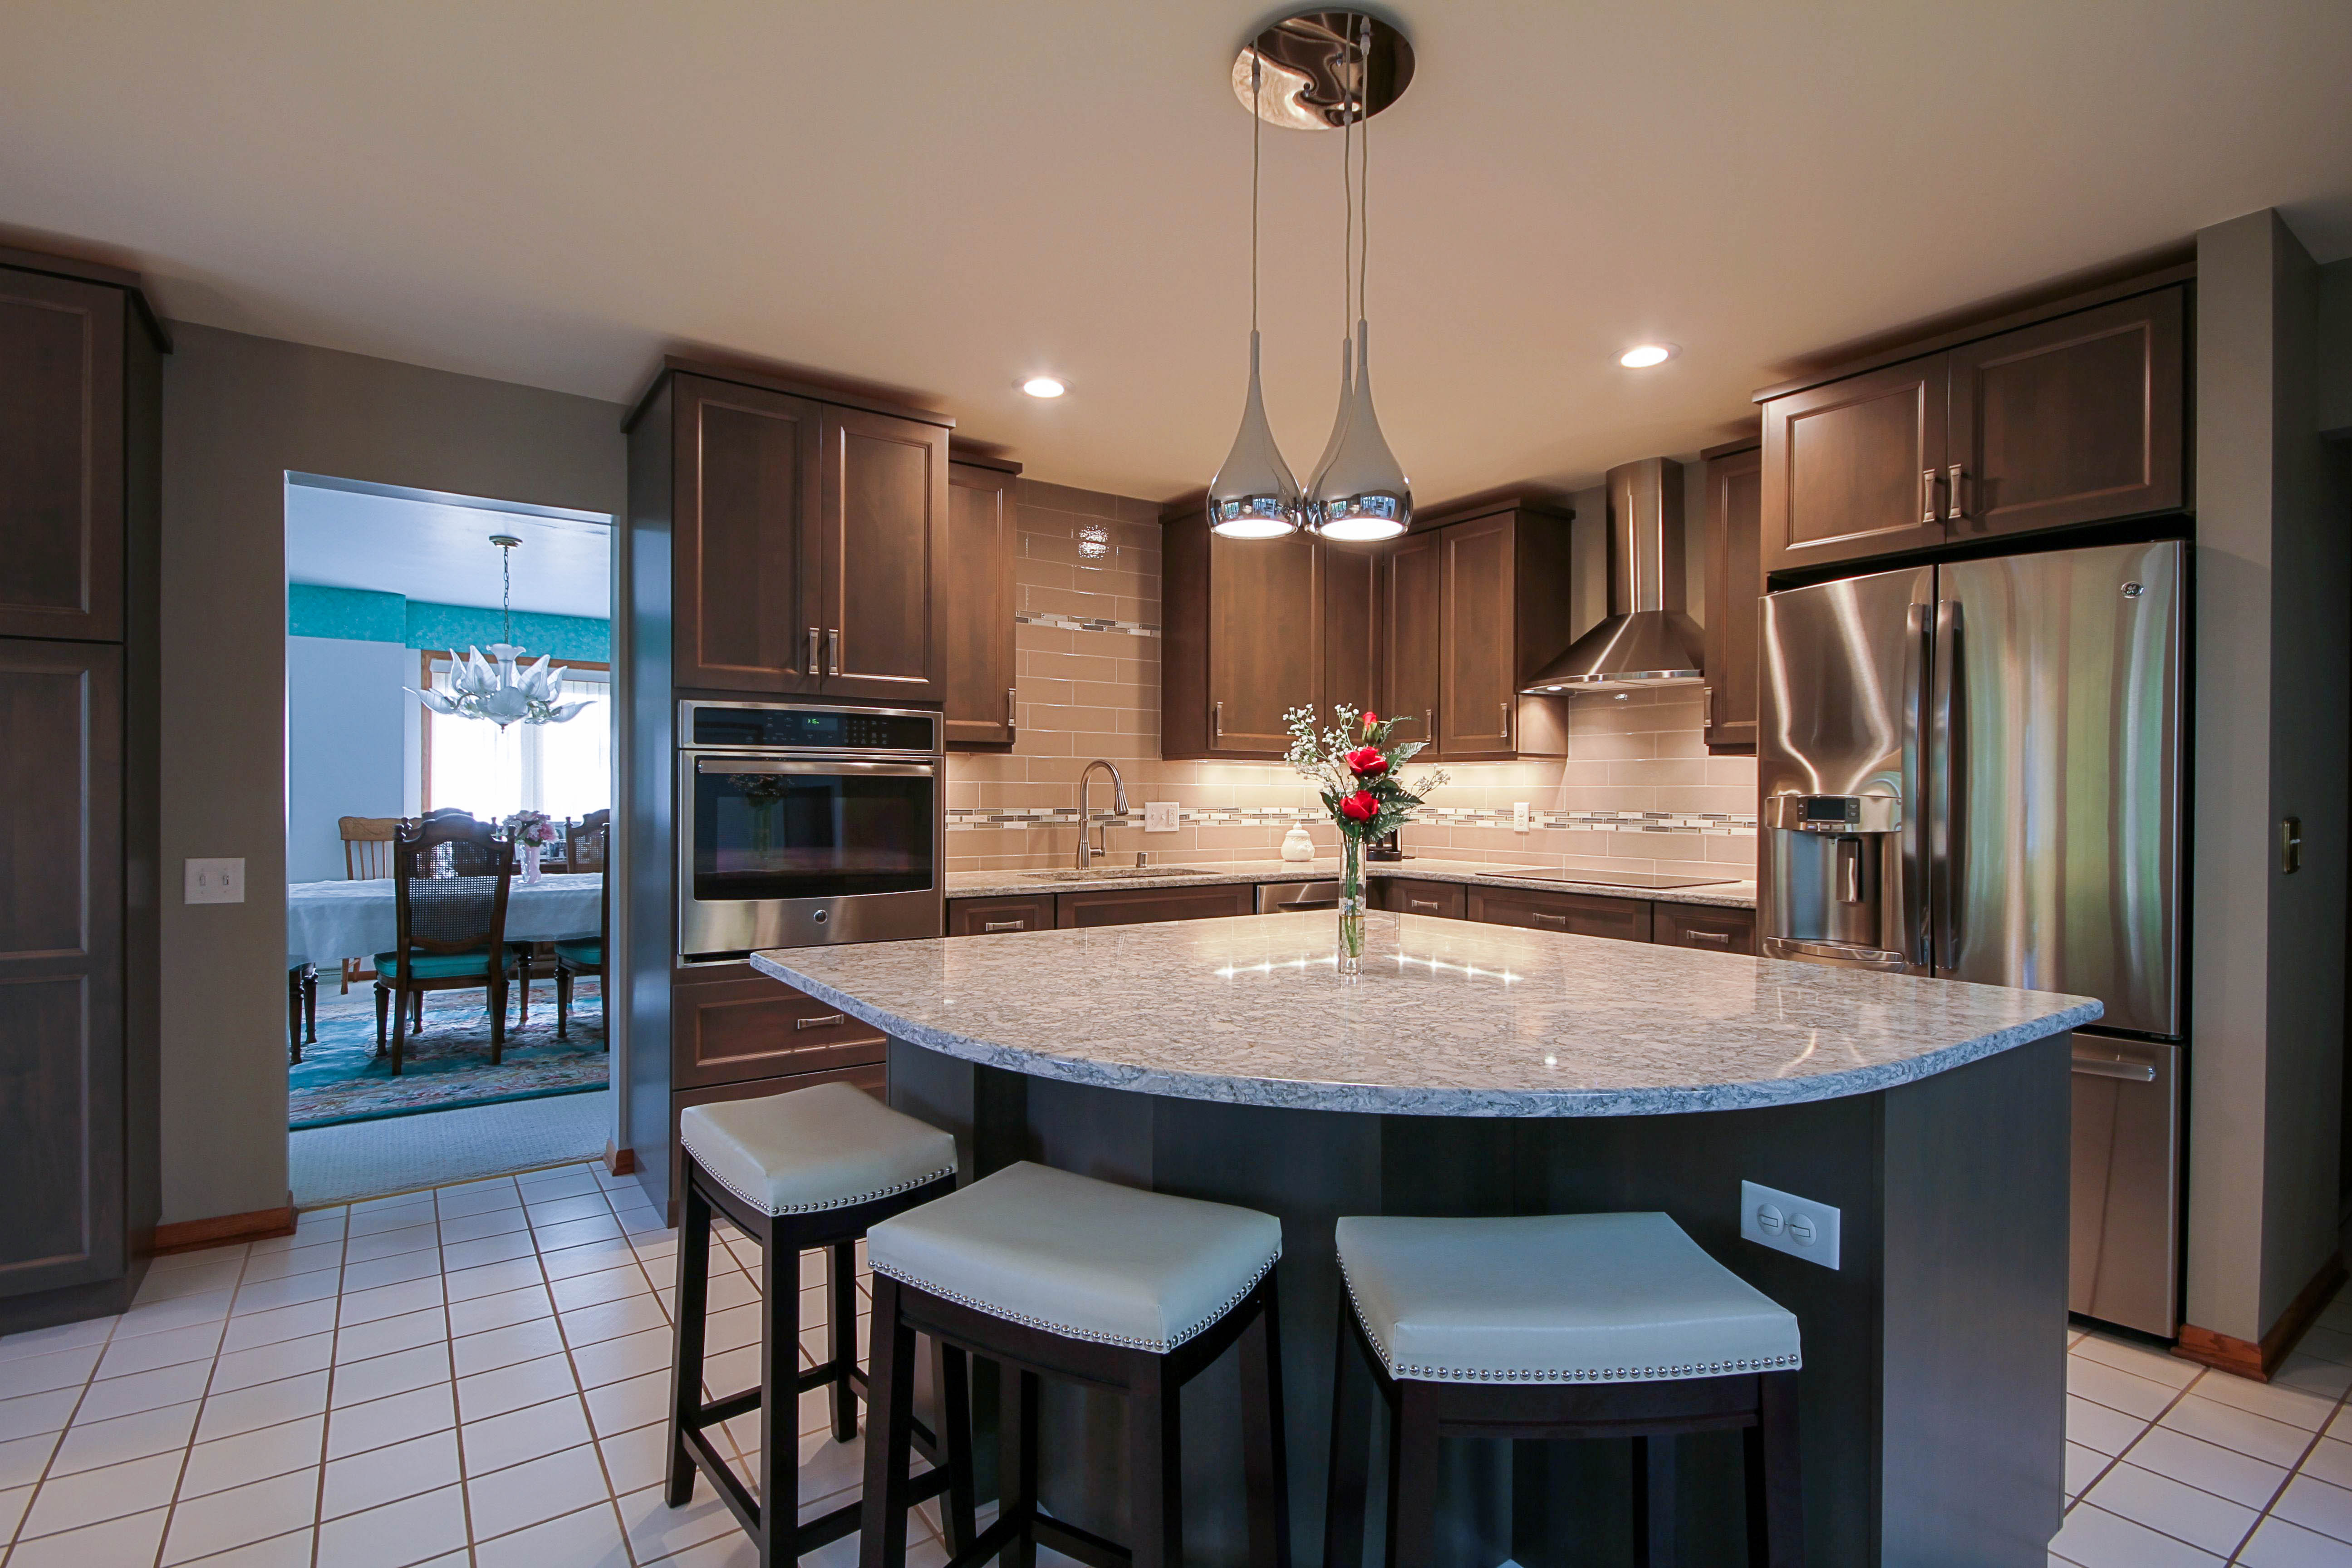 Kitchen Remodeling, pie shape kitchen island, kitchen pendant, white kitchen stools, grey cabinets